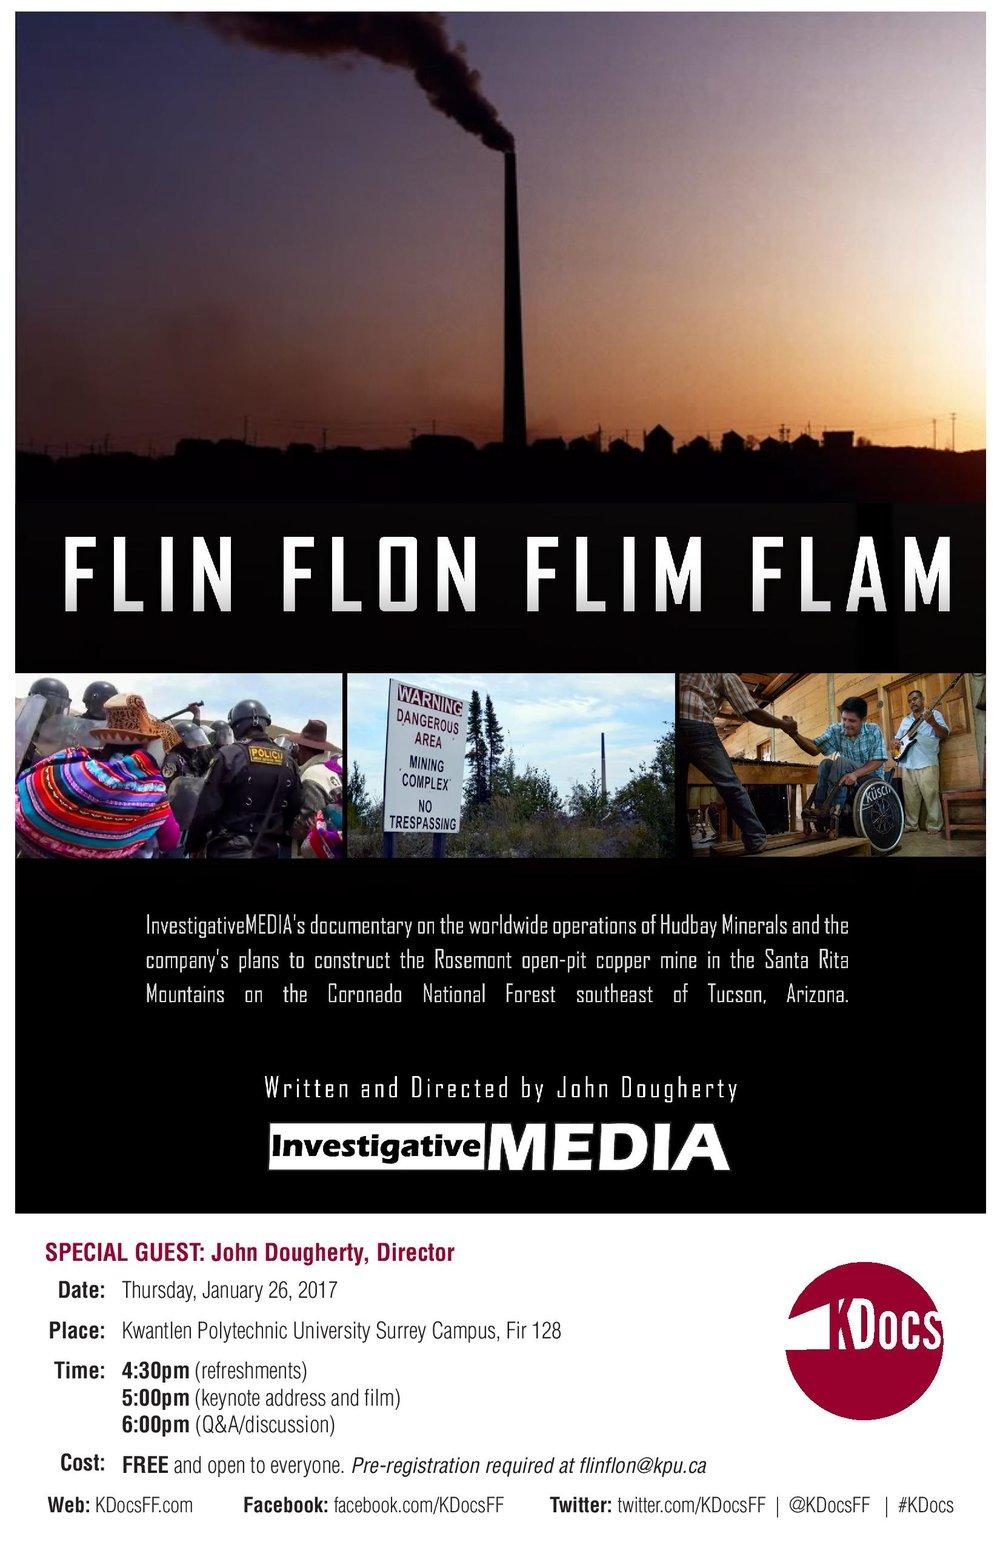 Flin Flon Flim Flam Poster.jpg